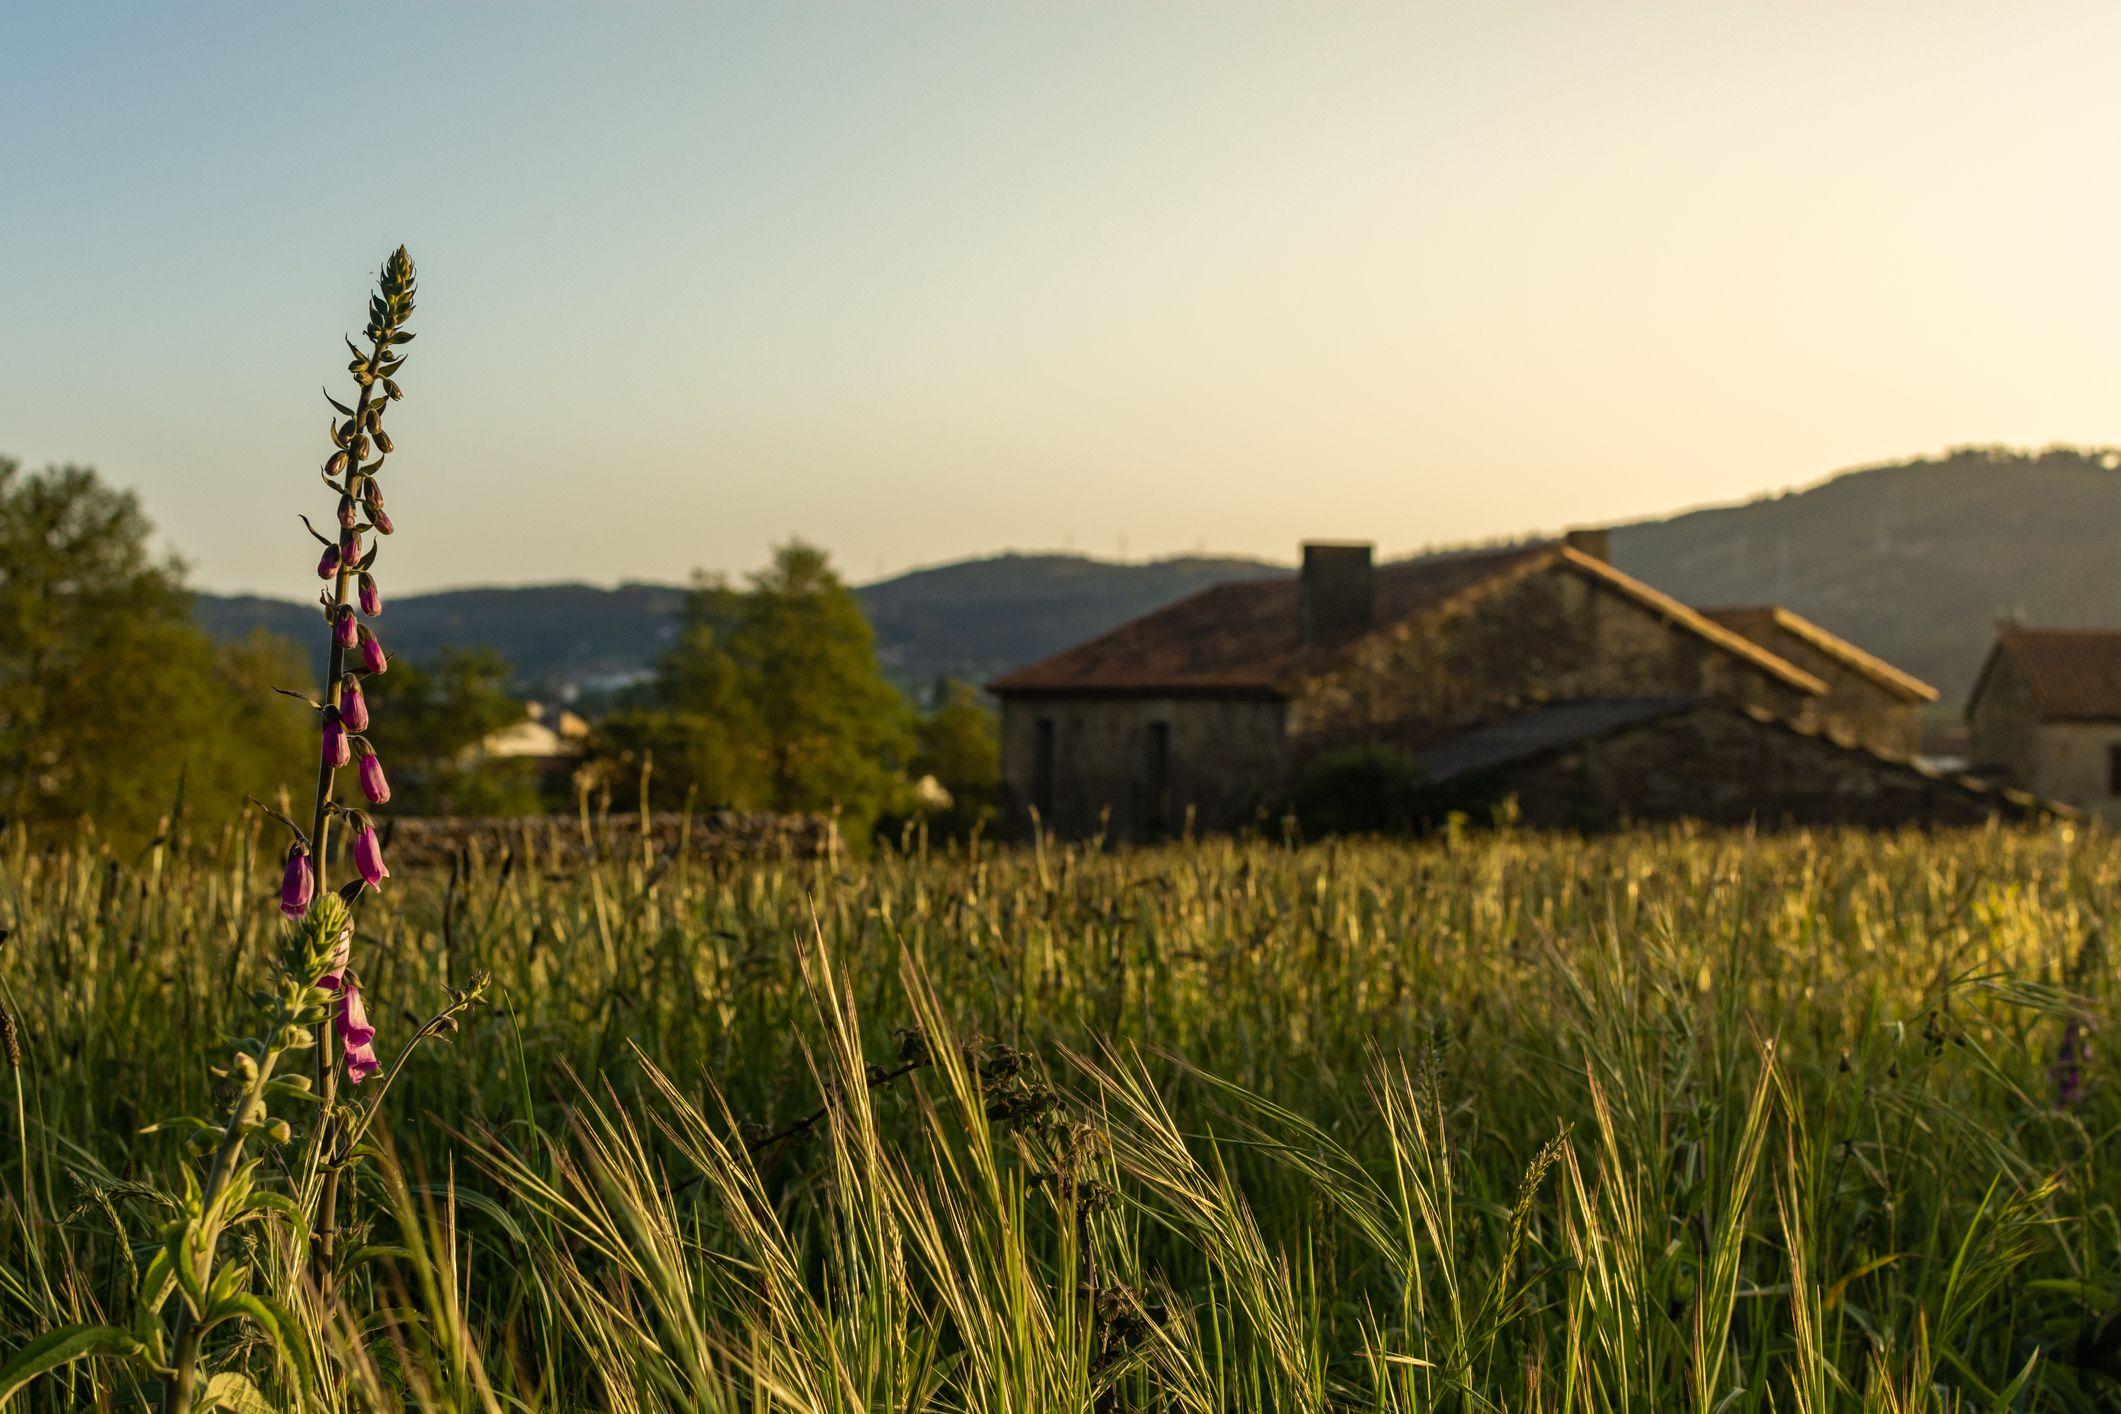 Trucos para conseguir fotos de paisajes naturales sin filtros